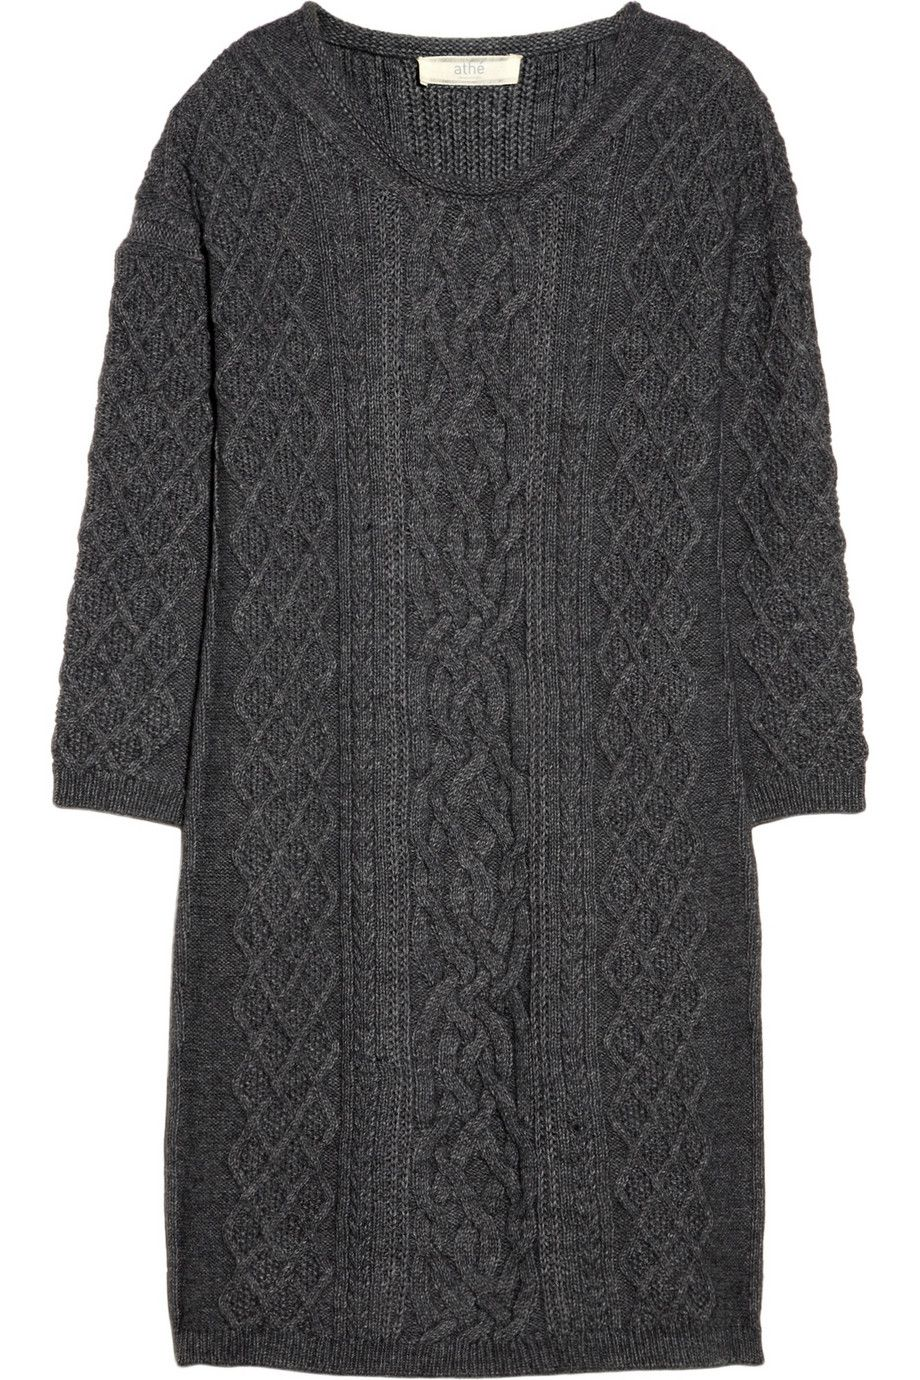 Vanessa Bruno Athé   Cable-knit sweater dress   NET-A-PORTER.COM   Knitting    Pinterest   Stricken 05f517272e